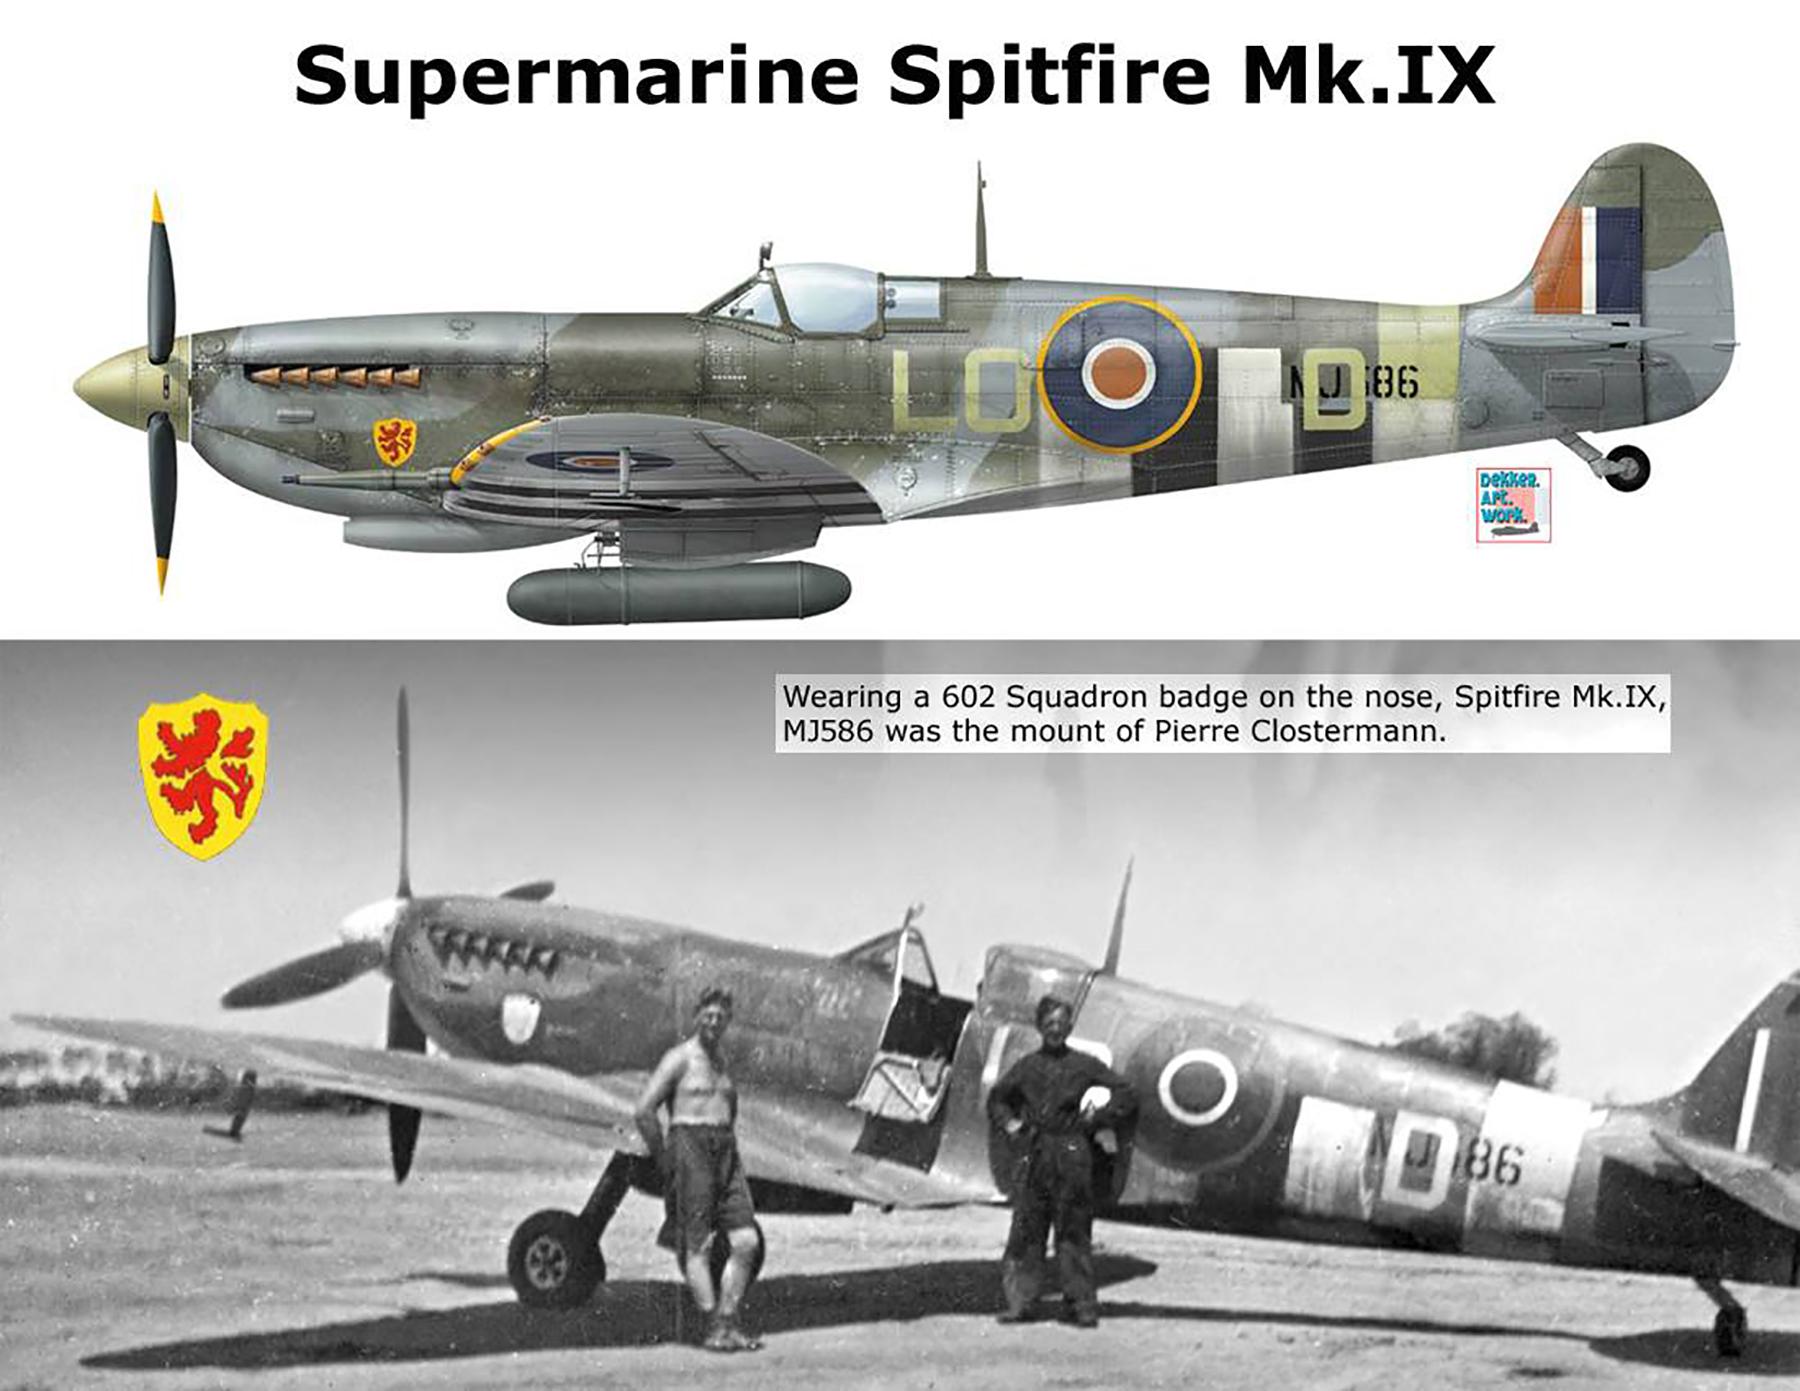 Spitfire LFIX RAF 602Sqn LOD Pierre Clostermann MJ586 Longues sur Mer 7th Jul 1944 0C